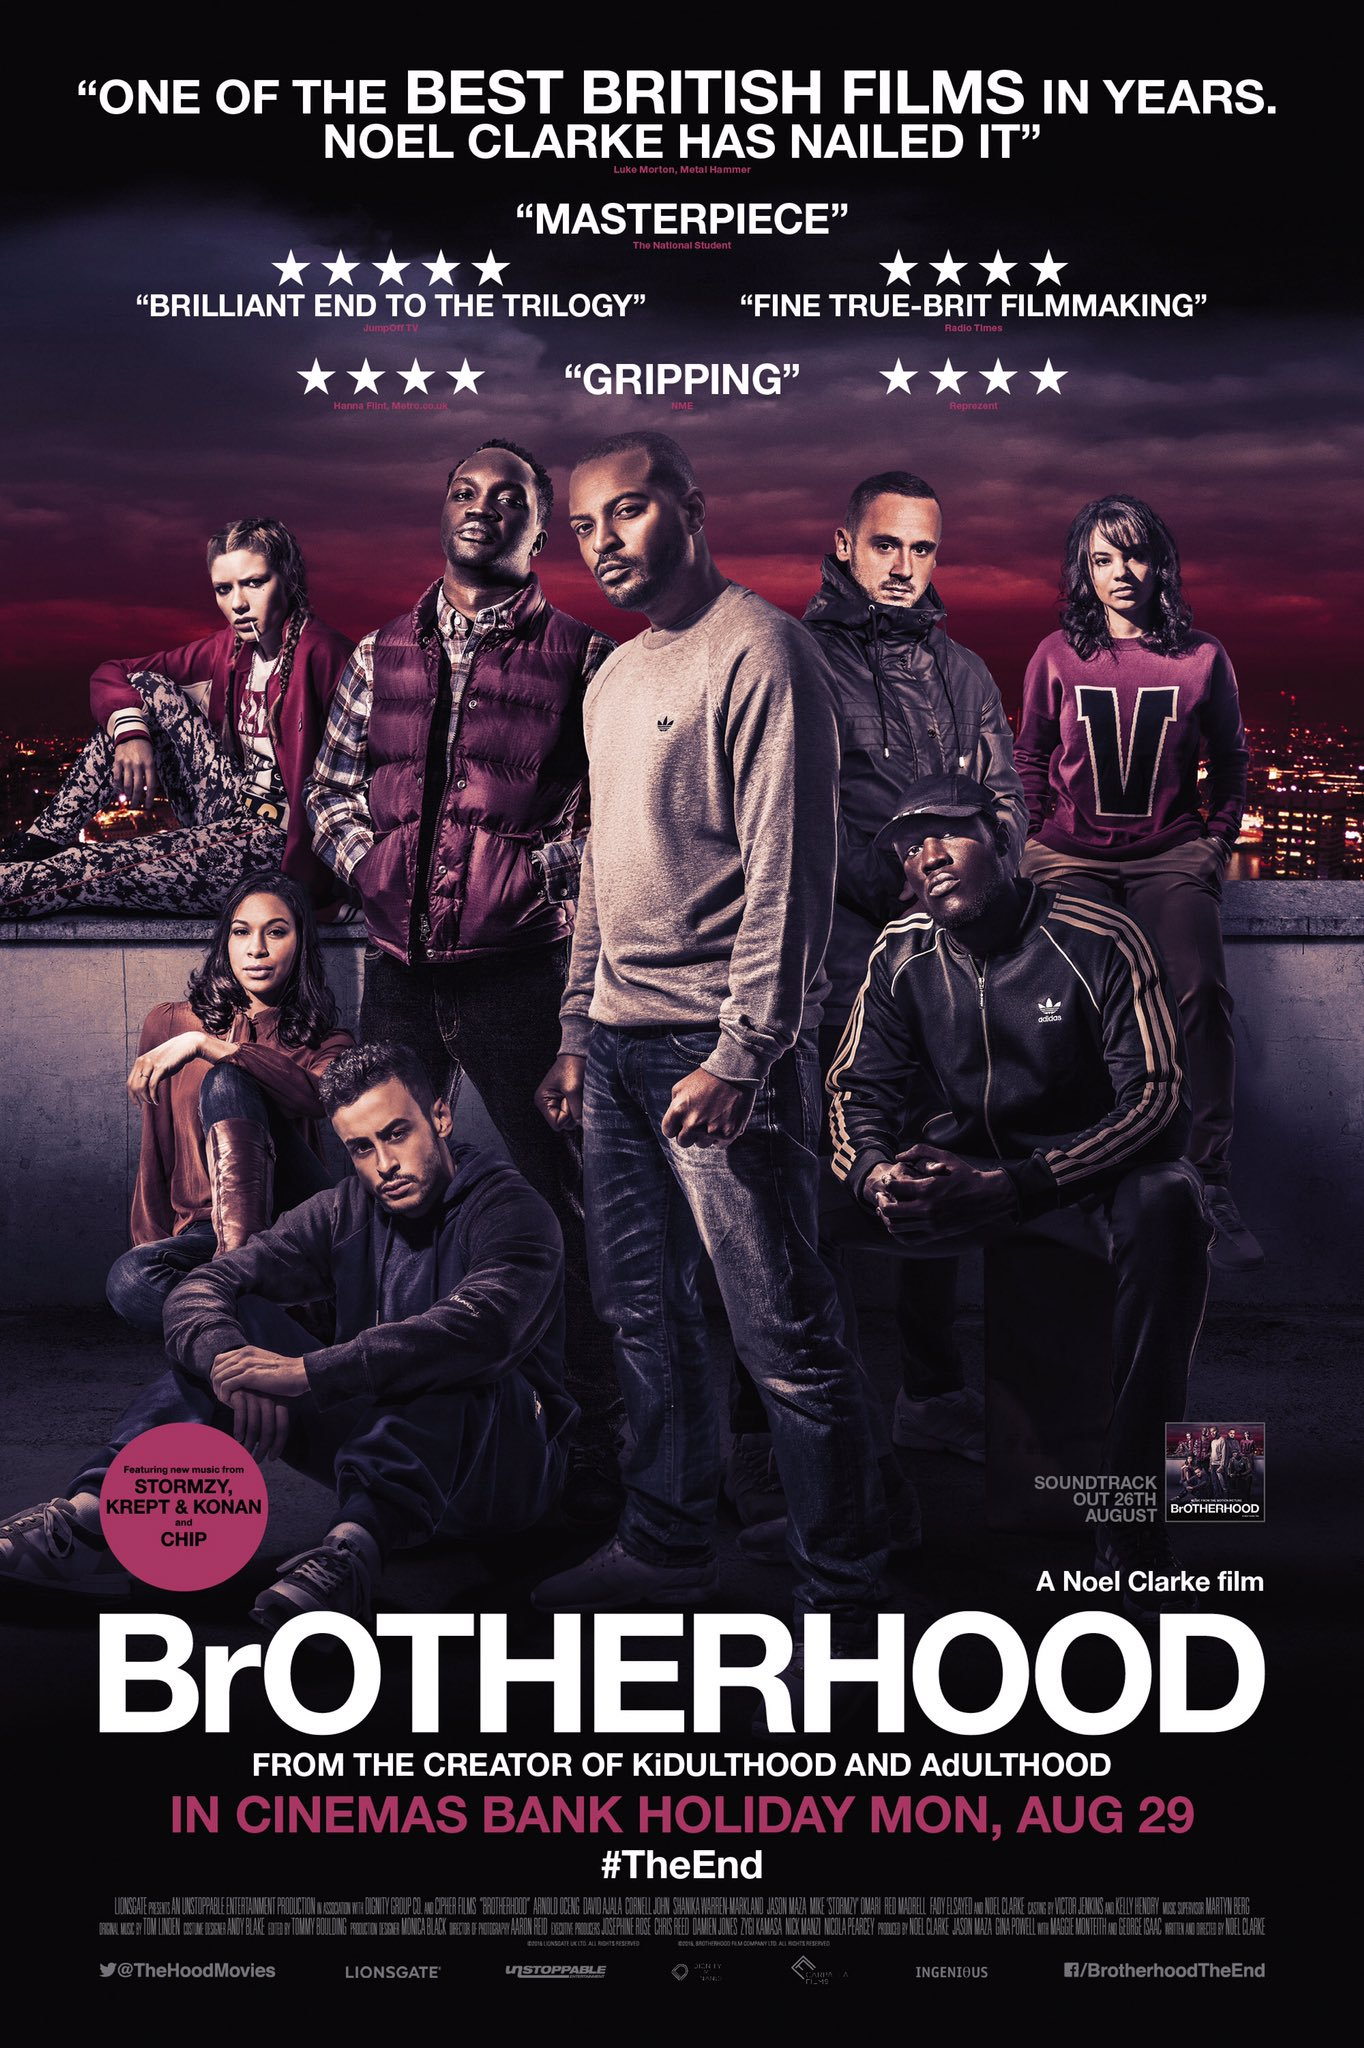 BROTHERHOOD (2016)  - VISUAL EFFECTS